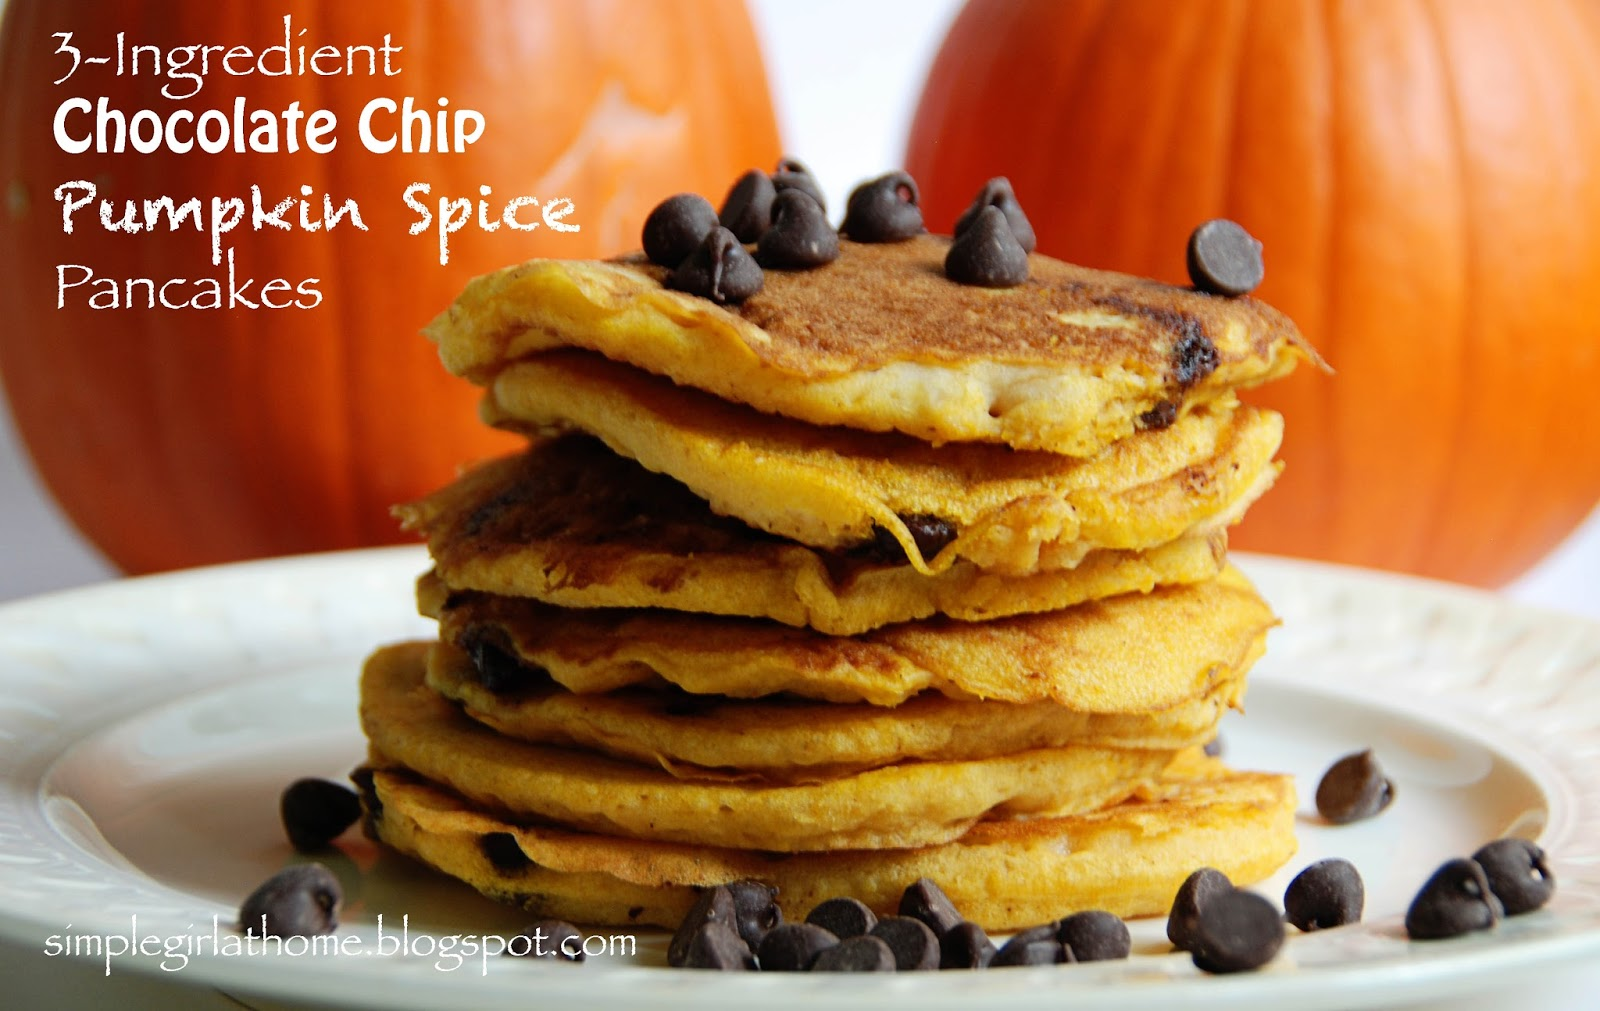 Simple Girl: 3-Ingredient Pumpkin Spice Chocolate Chip Pancakes